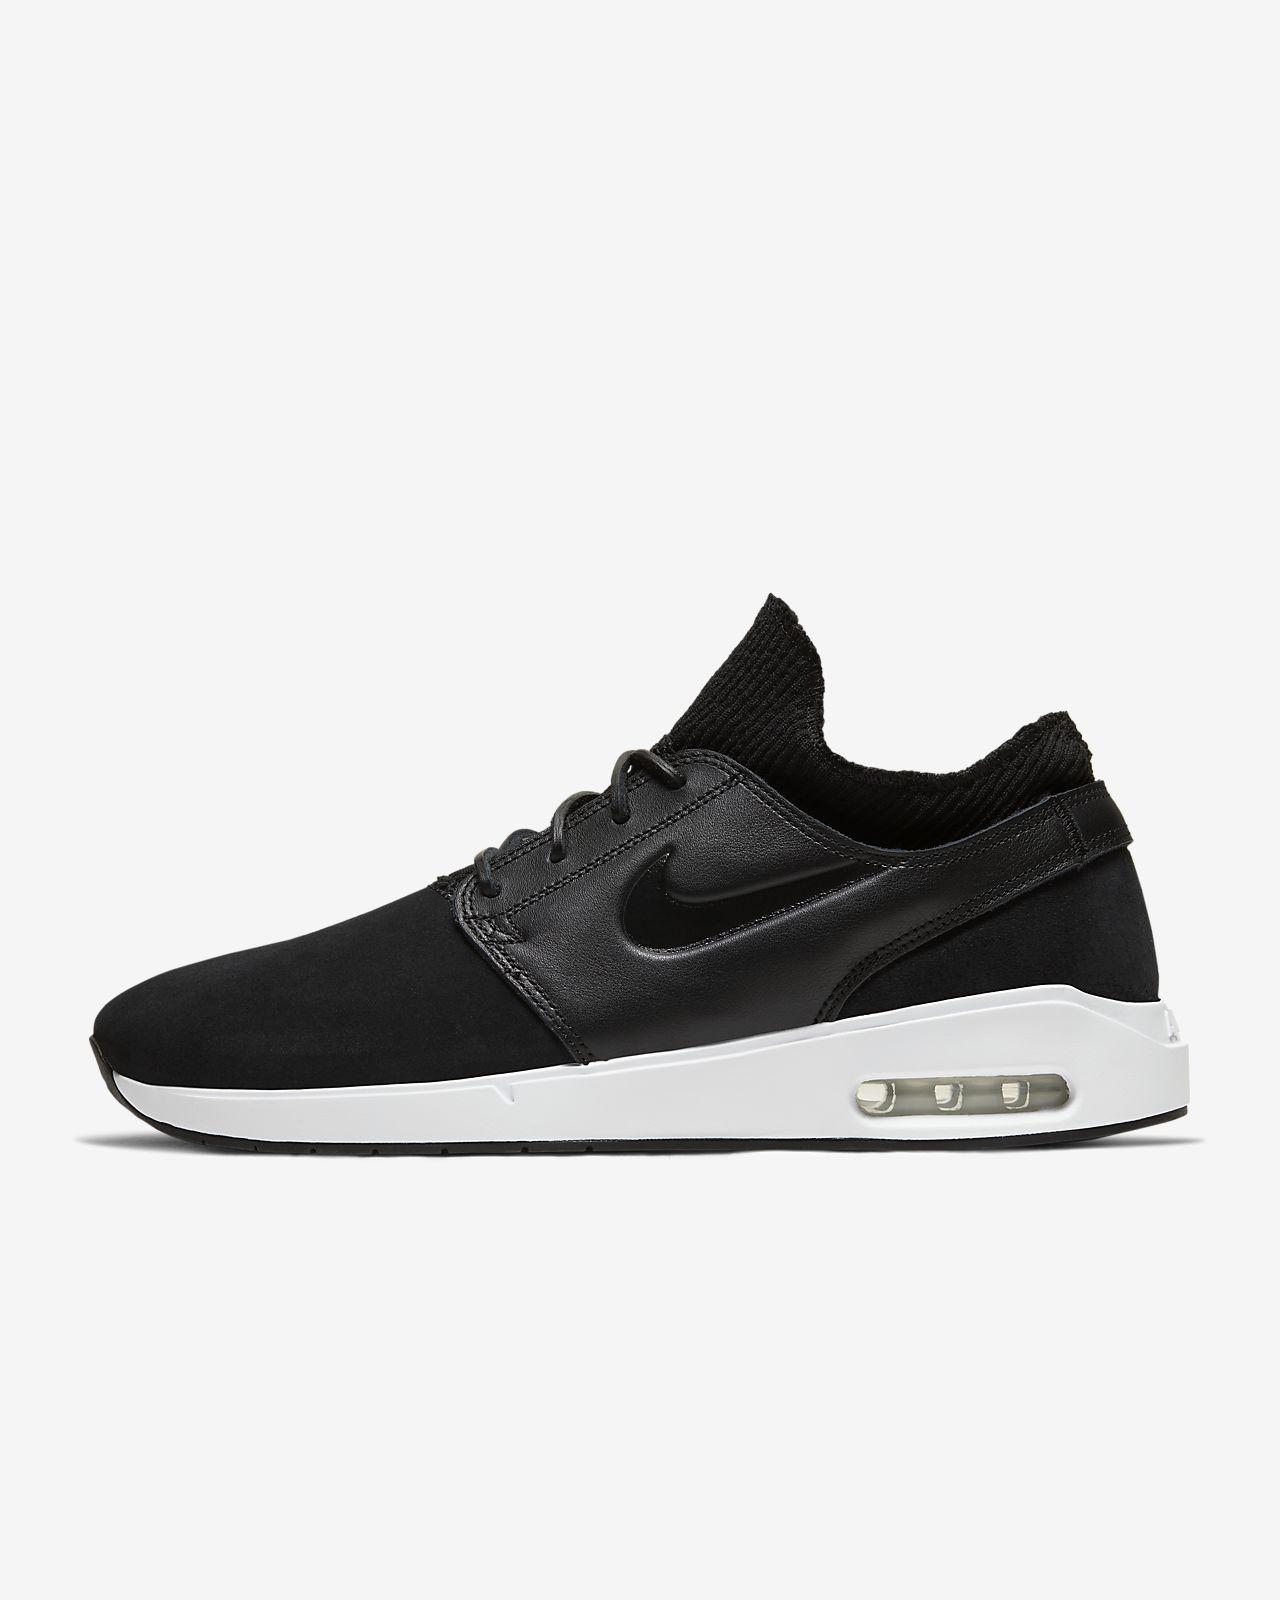 Nike SB Air Max Stefan Janoski 2 Premium Kaykay Ayakkabısı